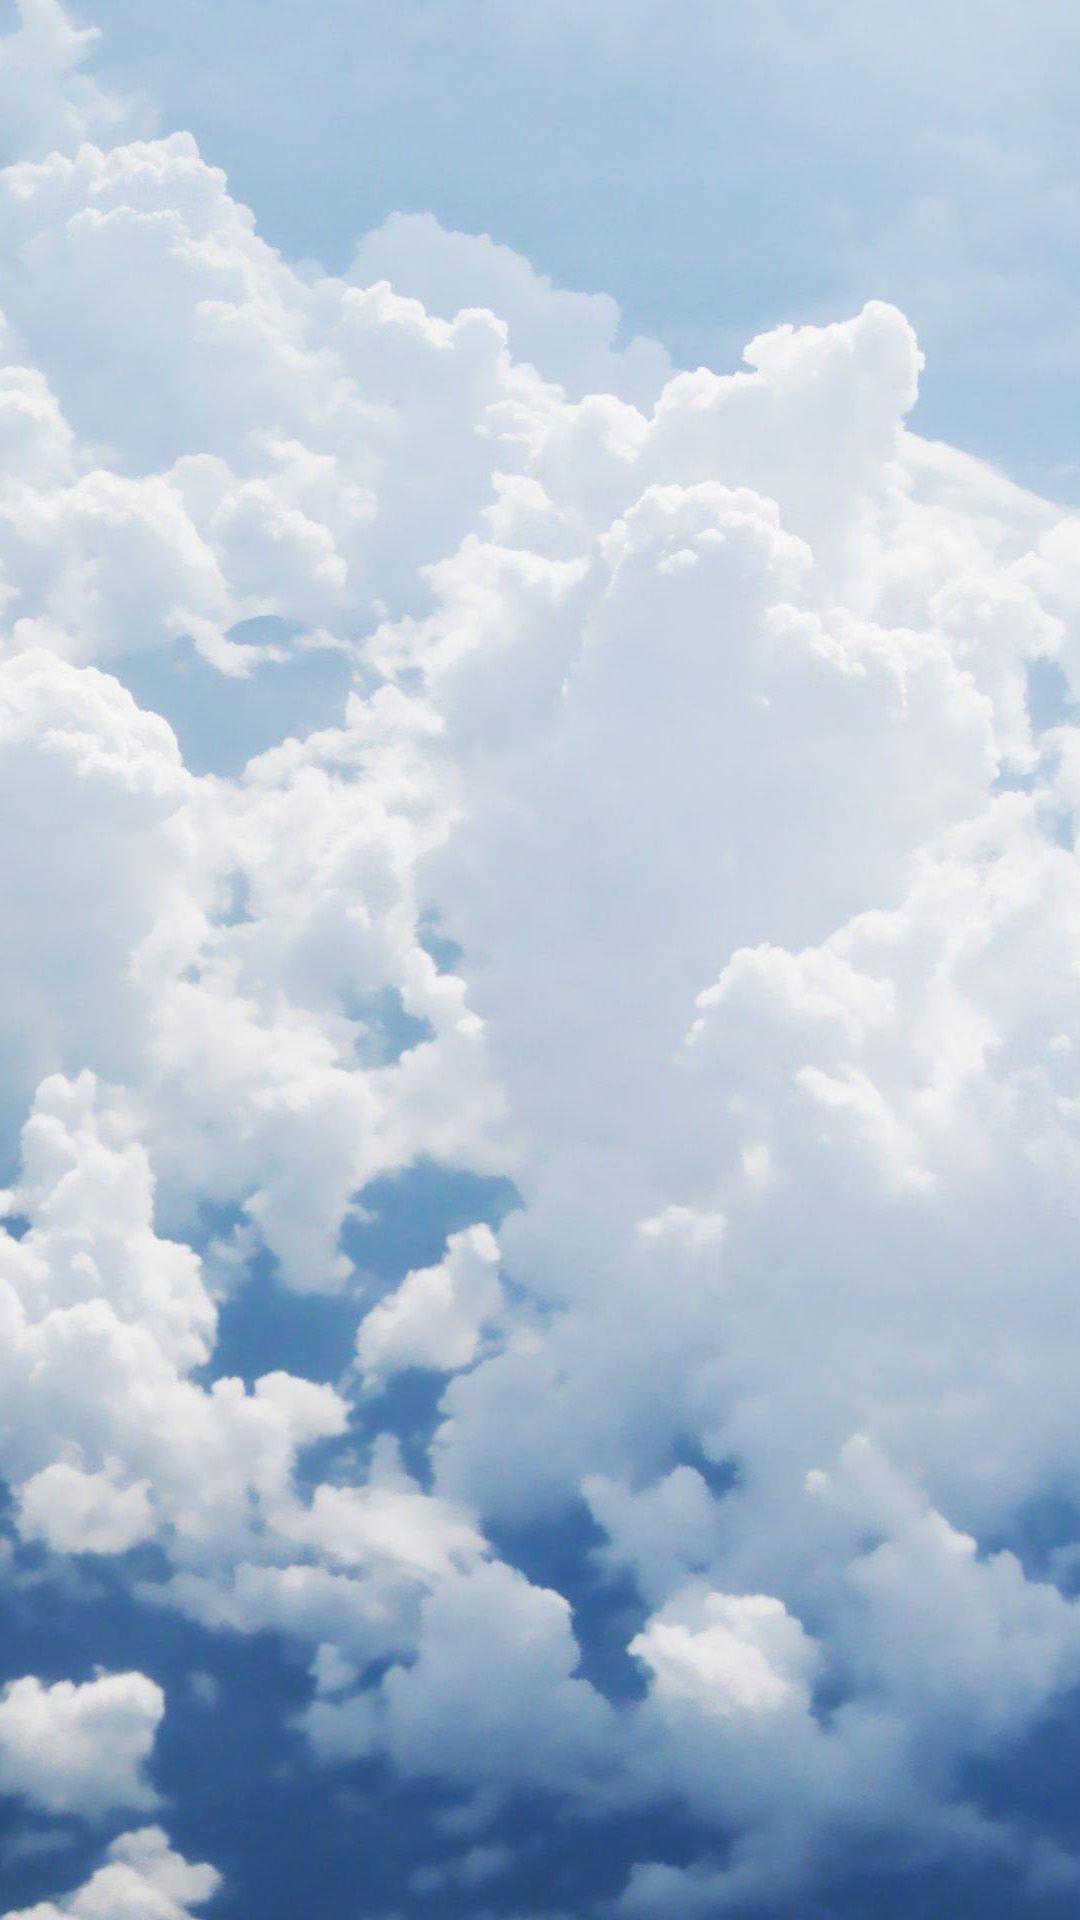 Puffy White Clouds iPhone 6 Plus HD Wallpaper iPod Wallpaper HD 1080x1920